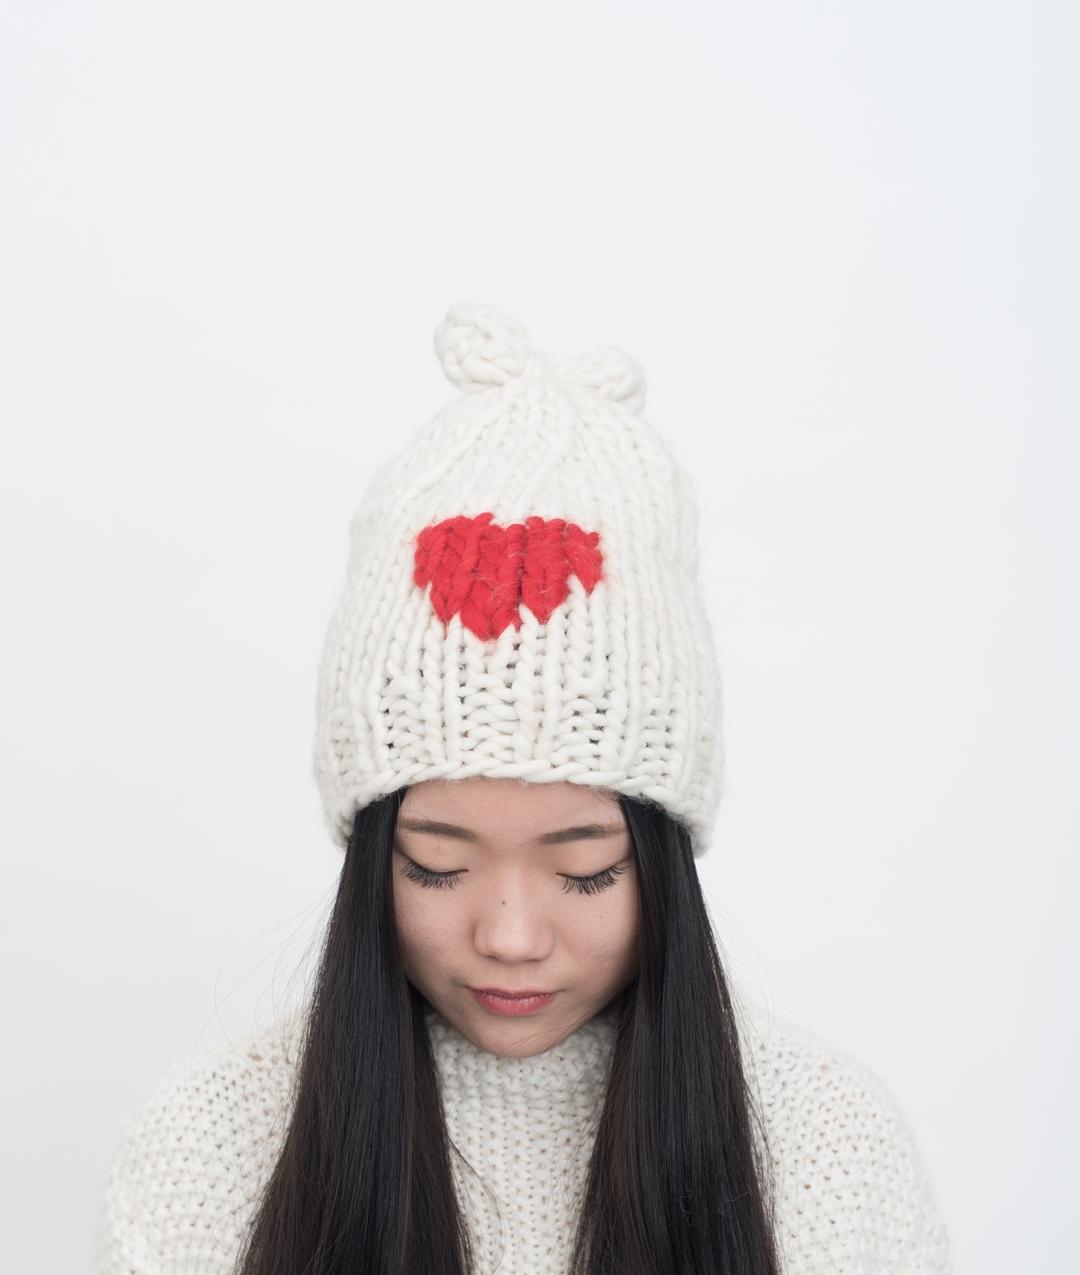 Hats and Beanies - Wool - Strange Love Beanie - 1